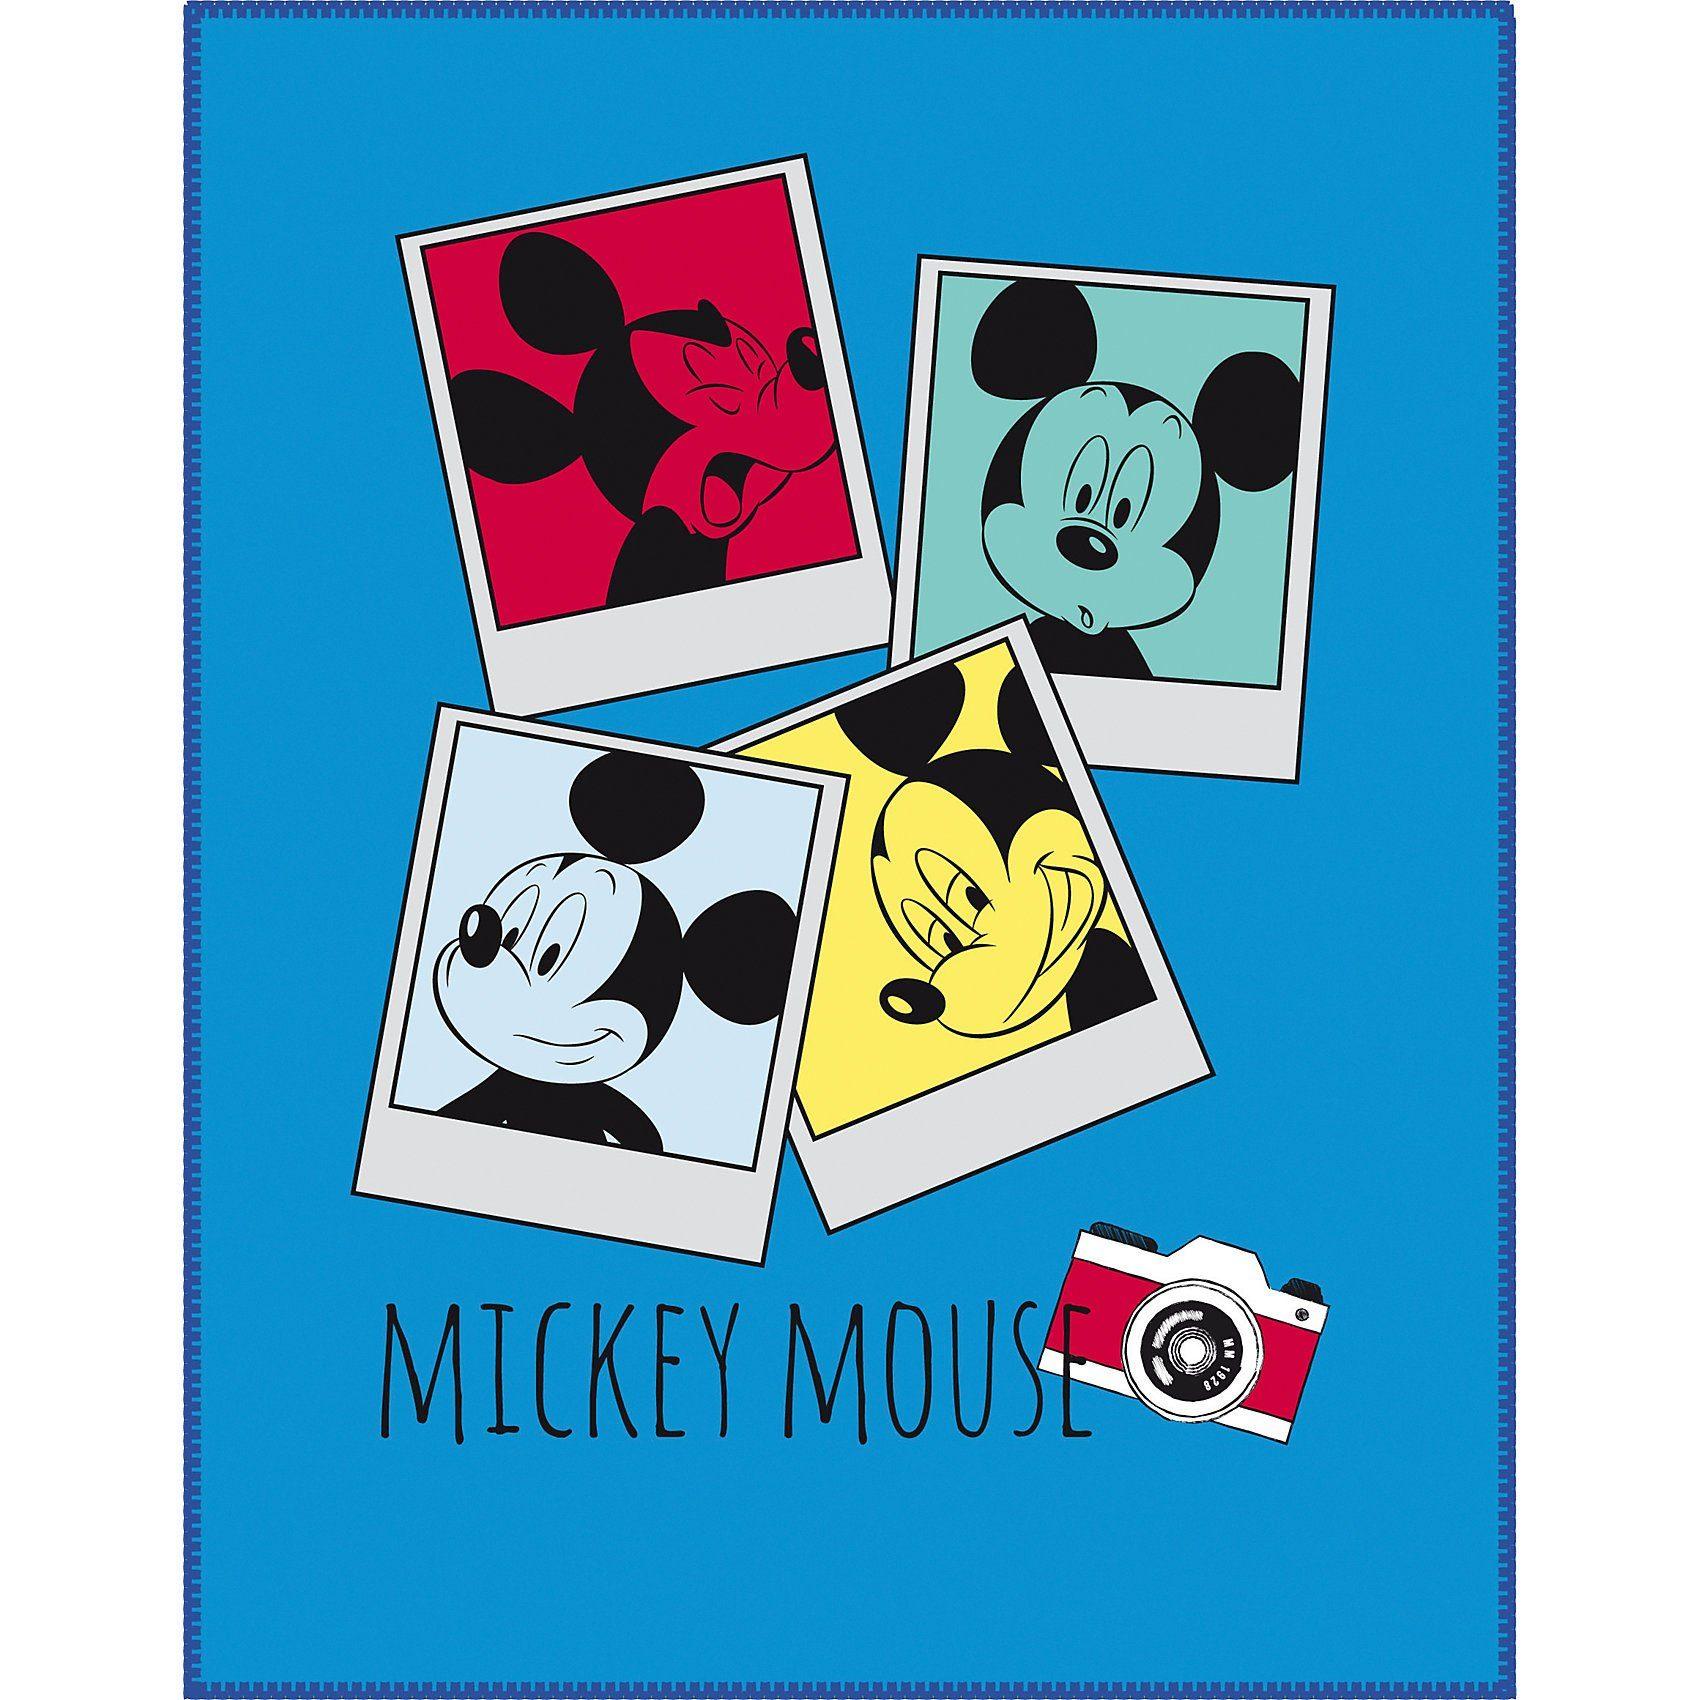 CTI Kuscheldecke Mickey Mouse, 110 x 140 cm